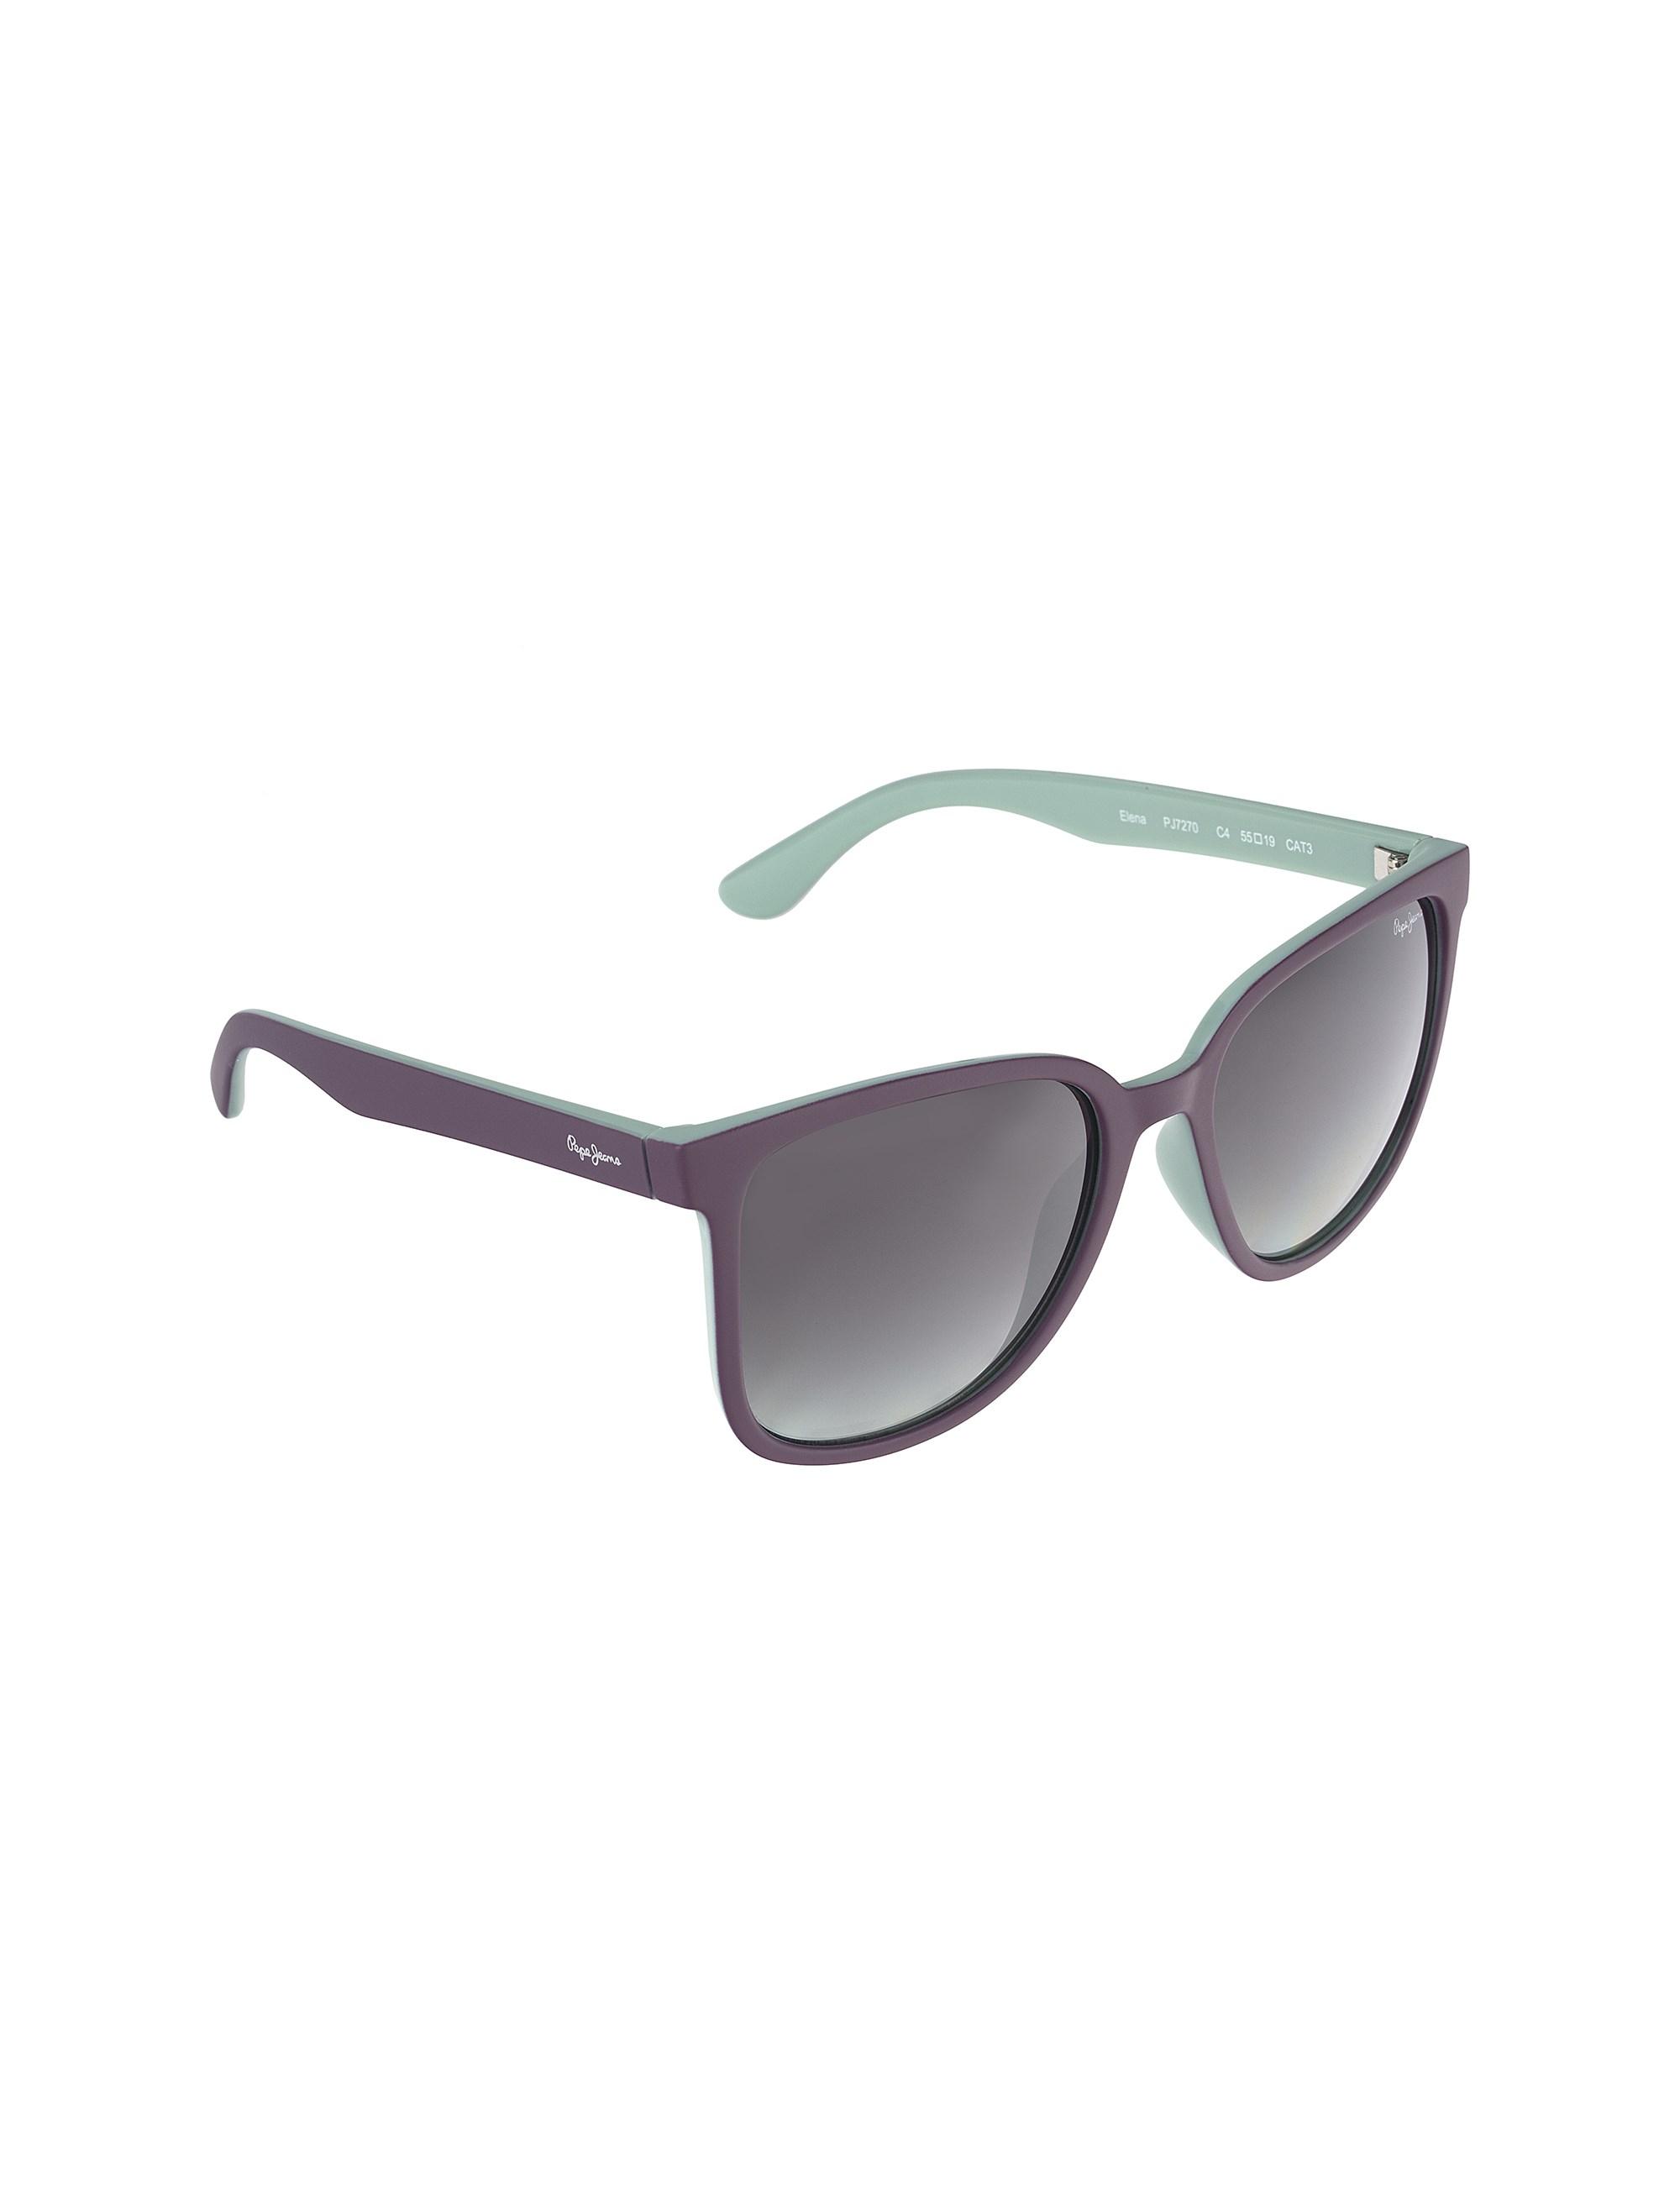 عینک آفتابی ویفرر زنانه